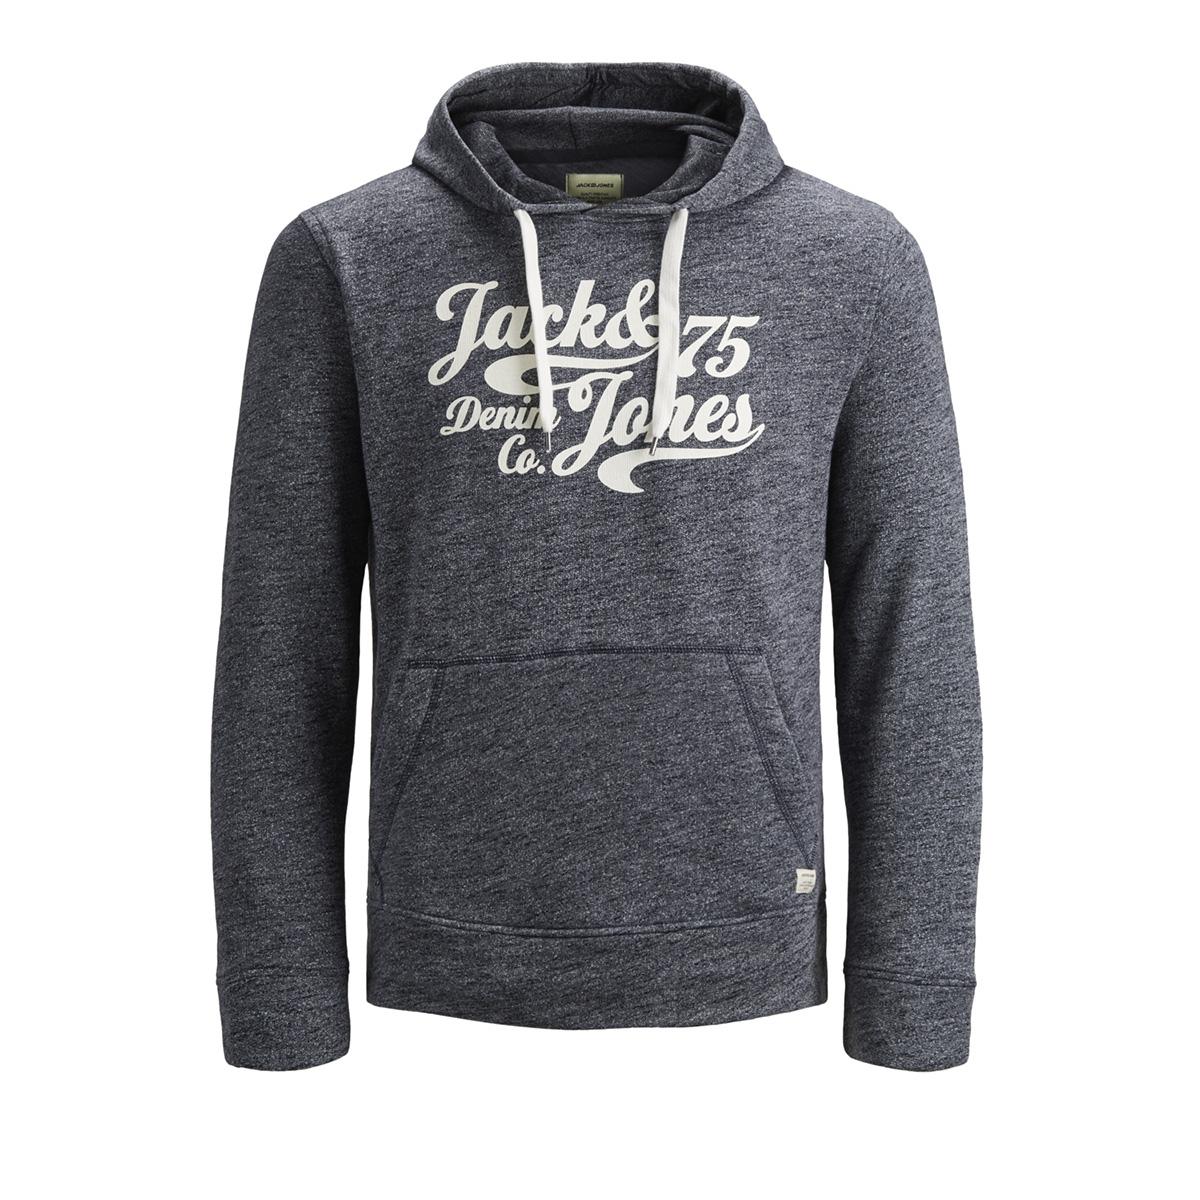 jjepanther sweat hood noos 12141011 jack & jones sweater navy blazer/reg fit